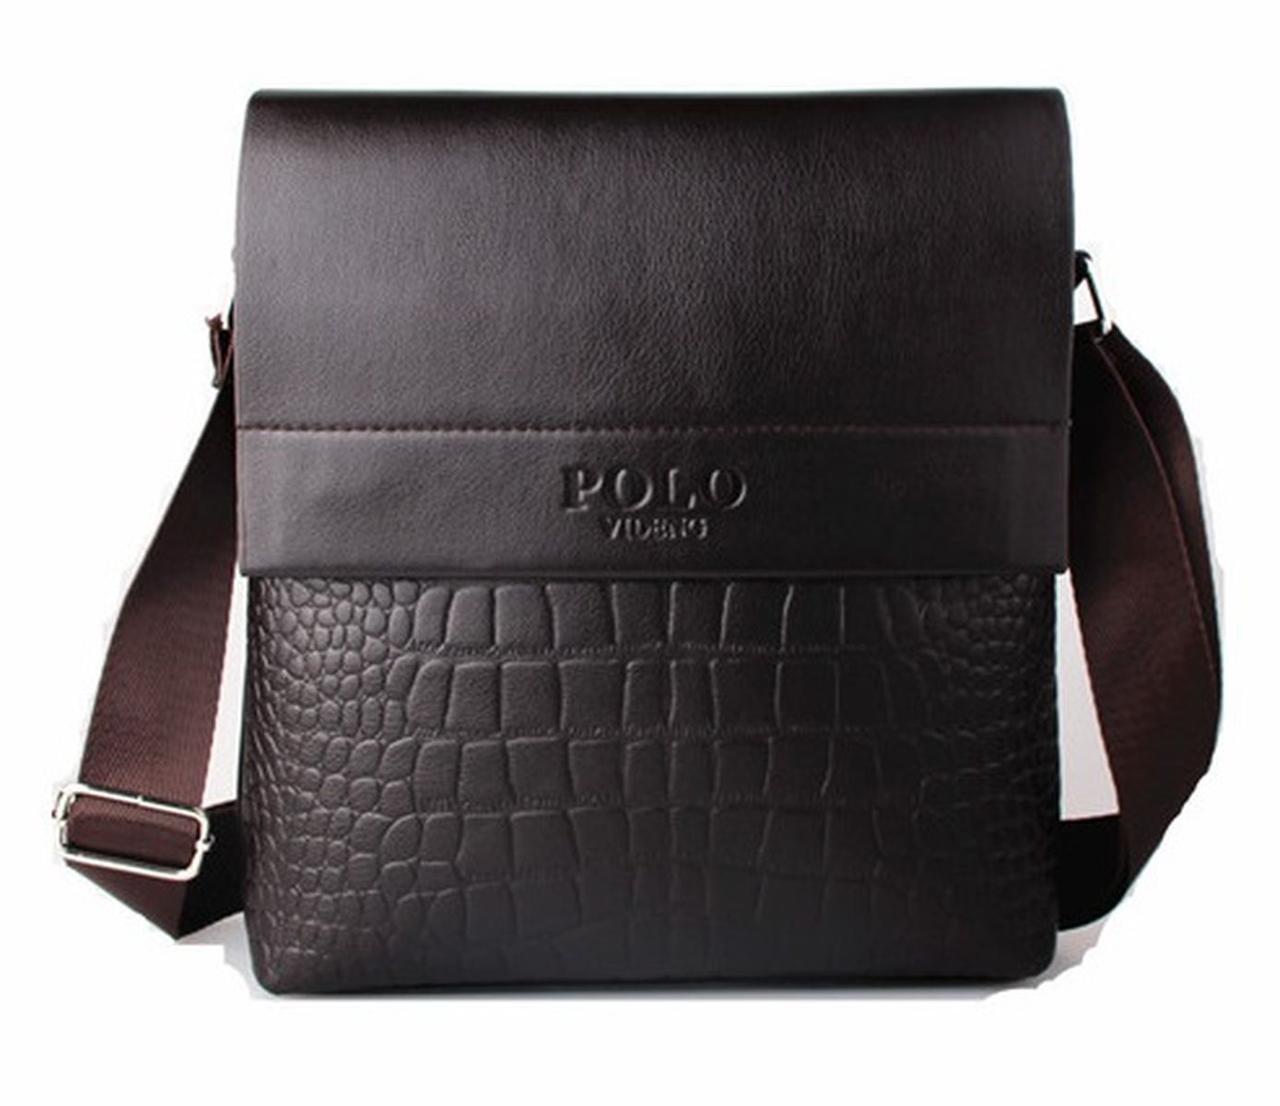 Мужская сумка Tina Polo Videng через плечо